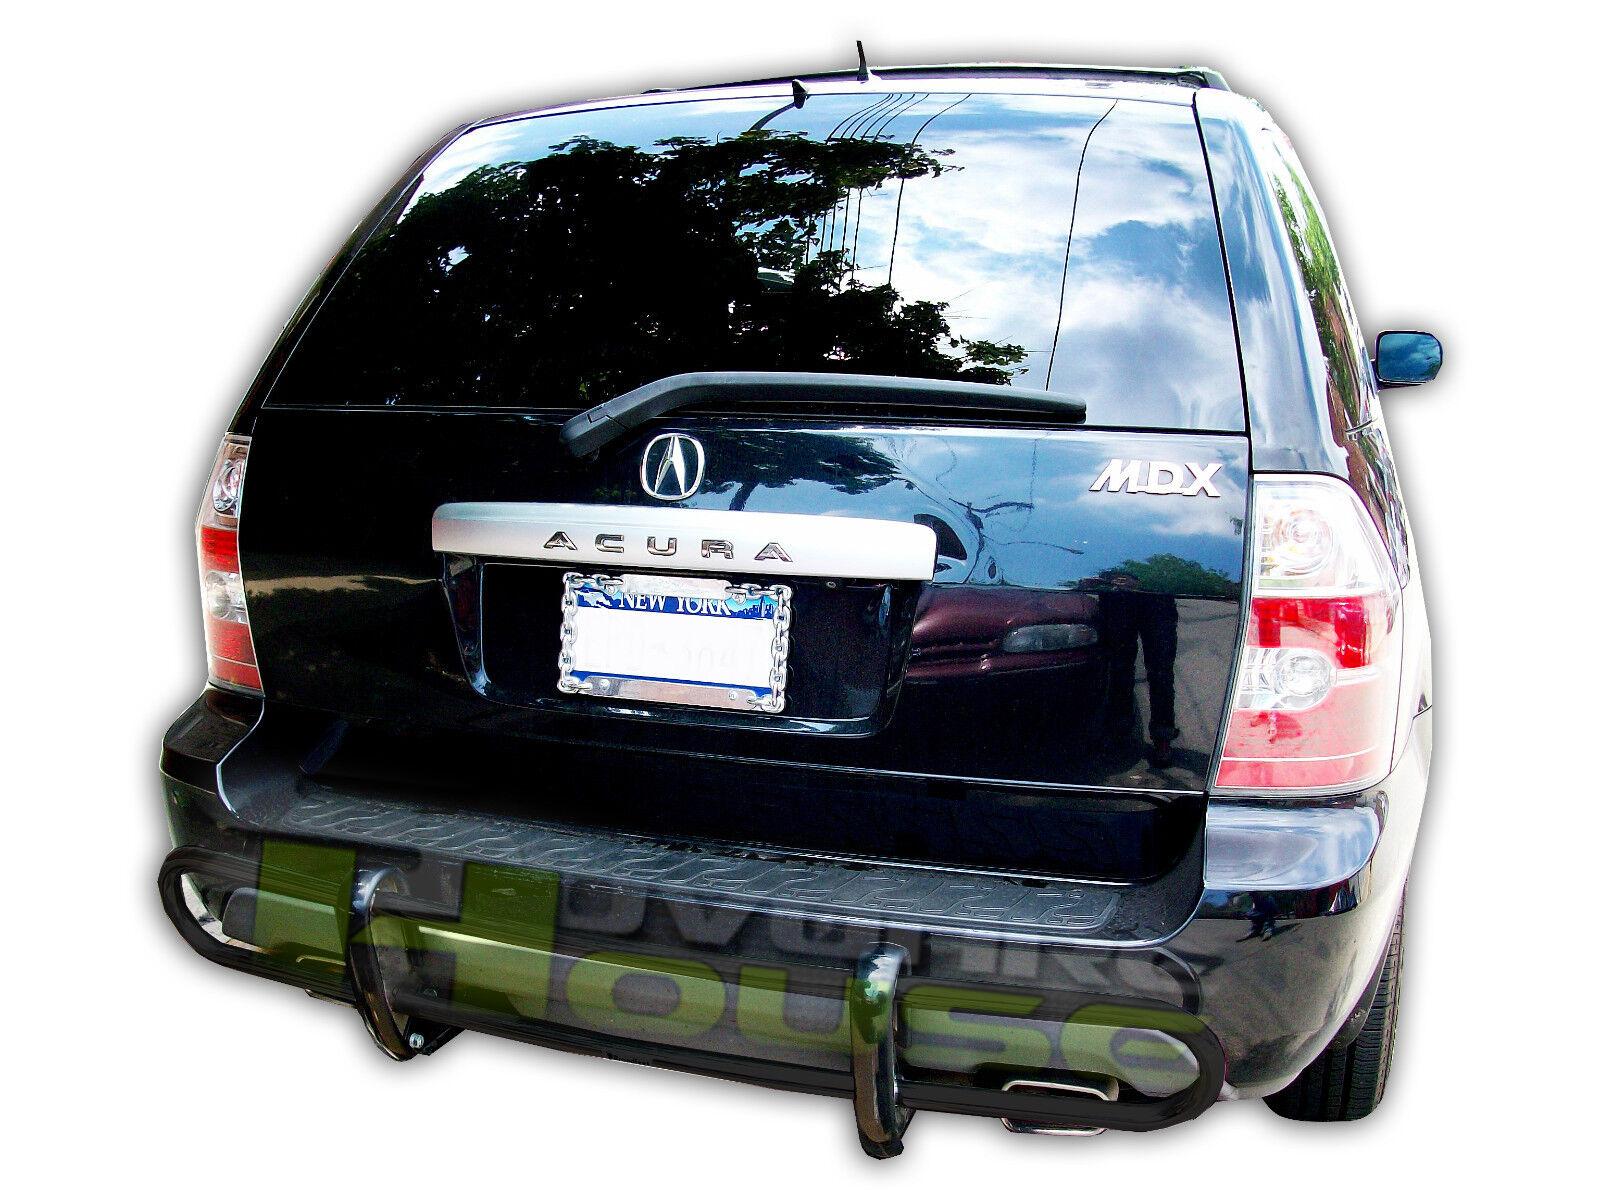 Wynntech A-Bar Front Bumper Guard Skid Plate Fit: 2008-2012 Ford Escape